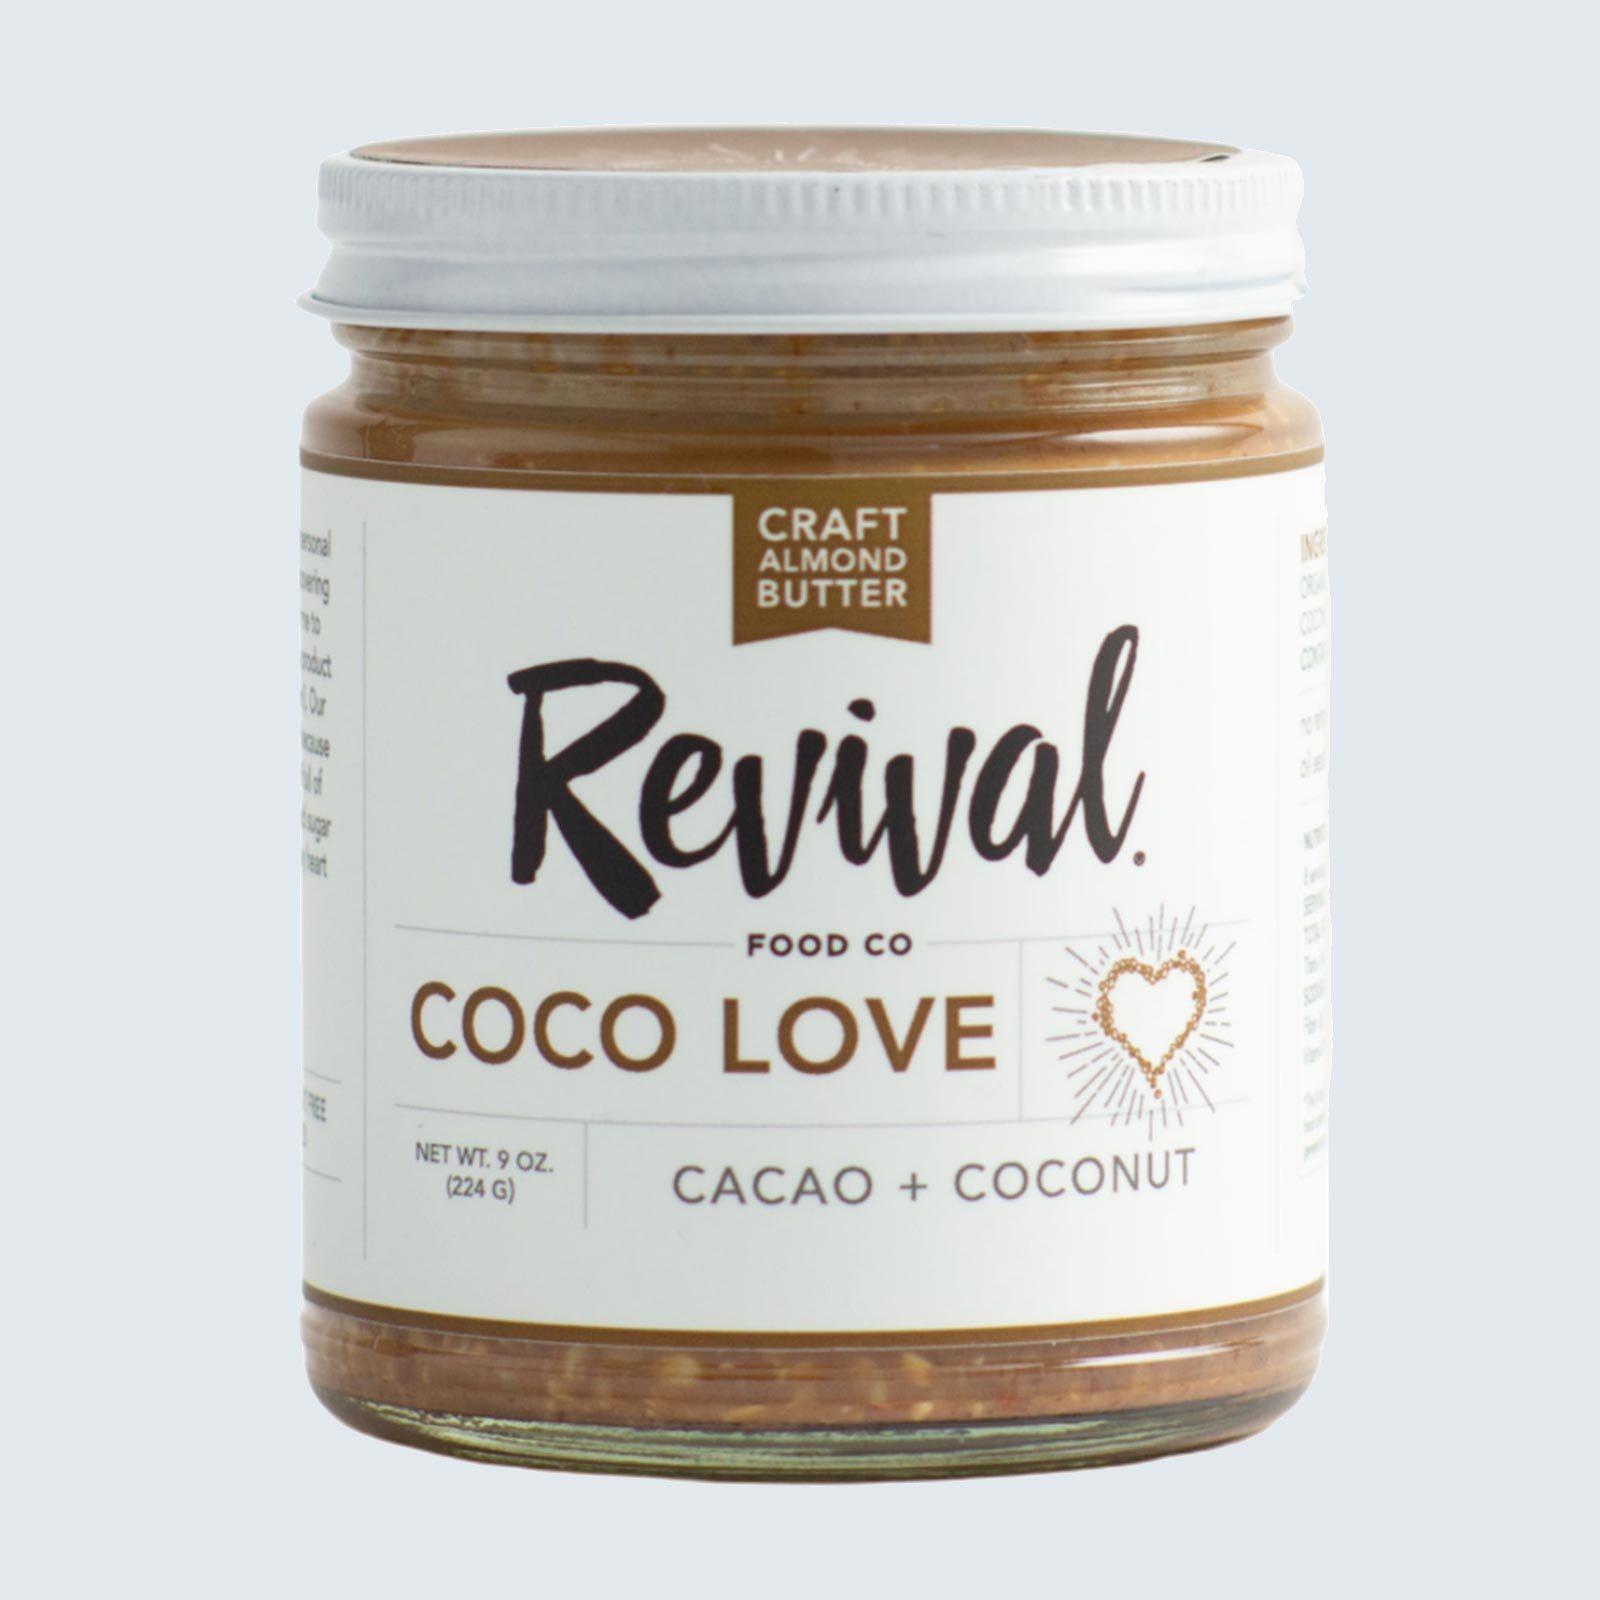 Revival Coco Love Almond Butter